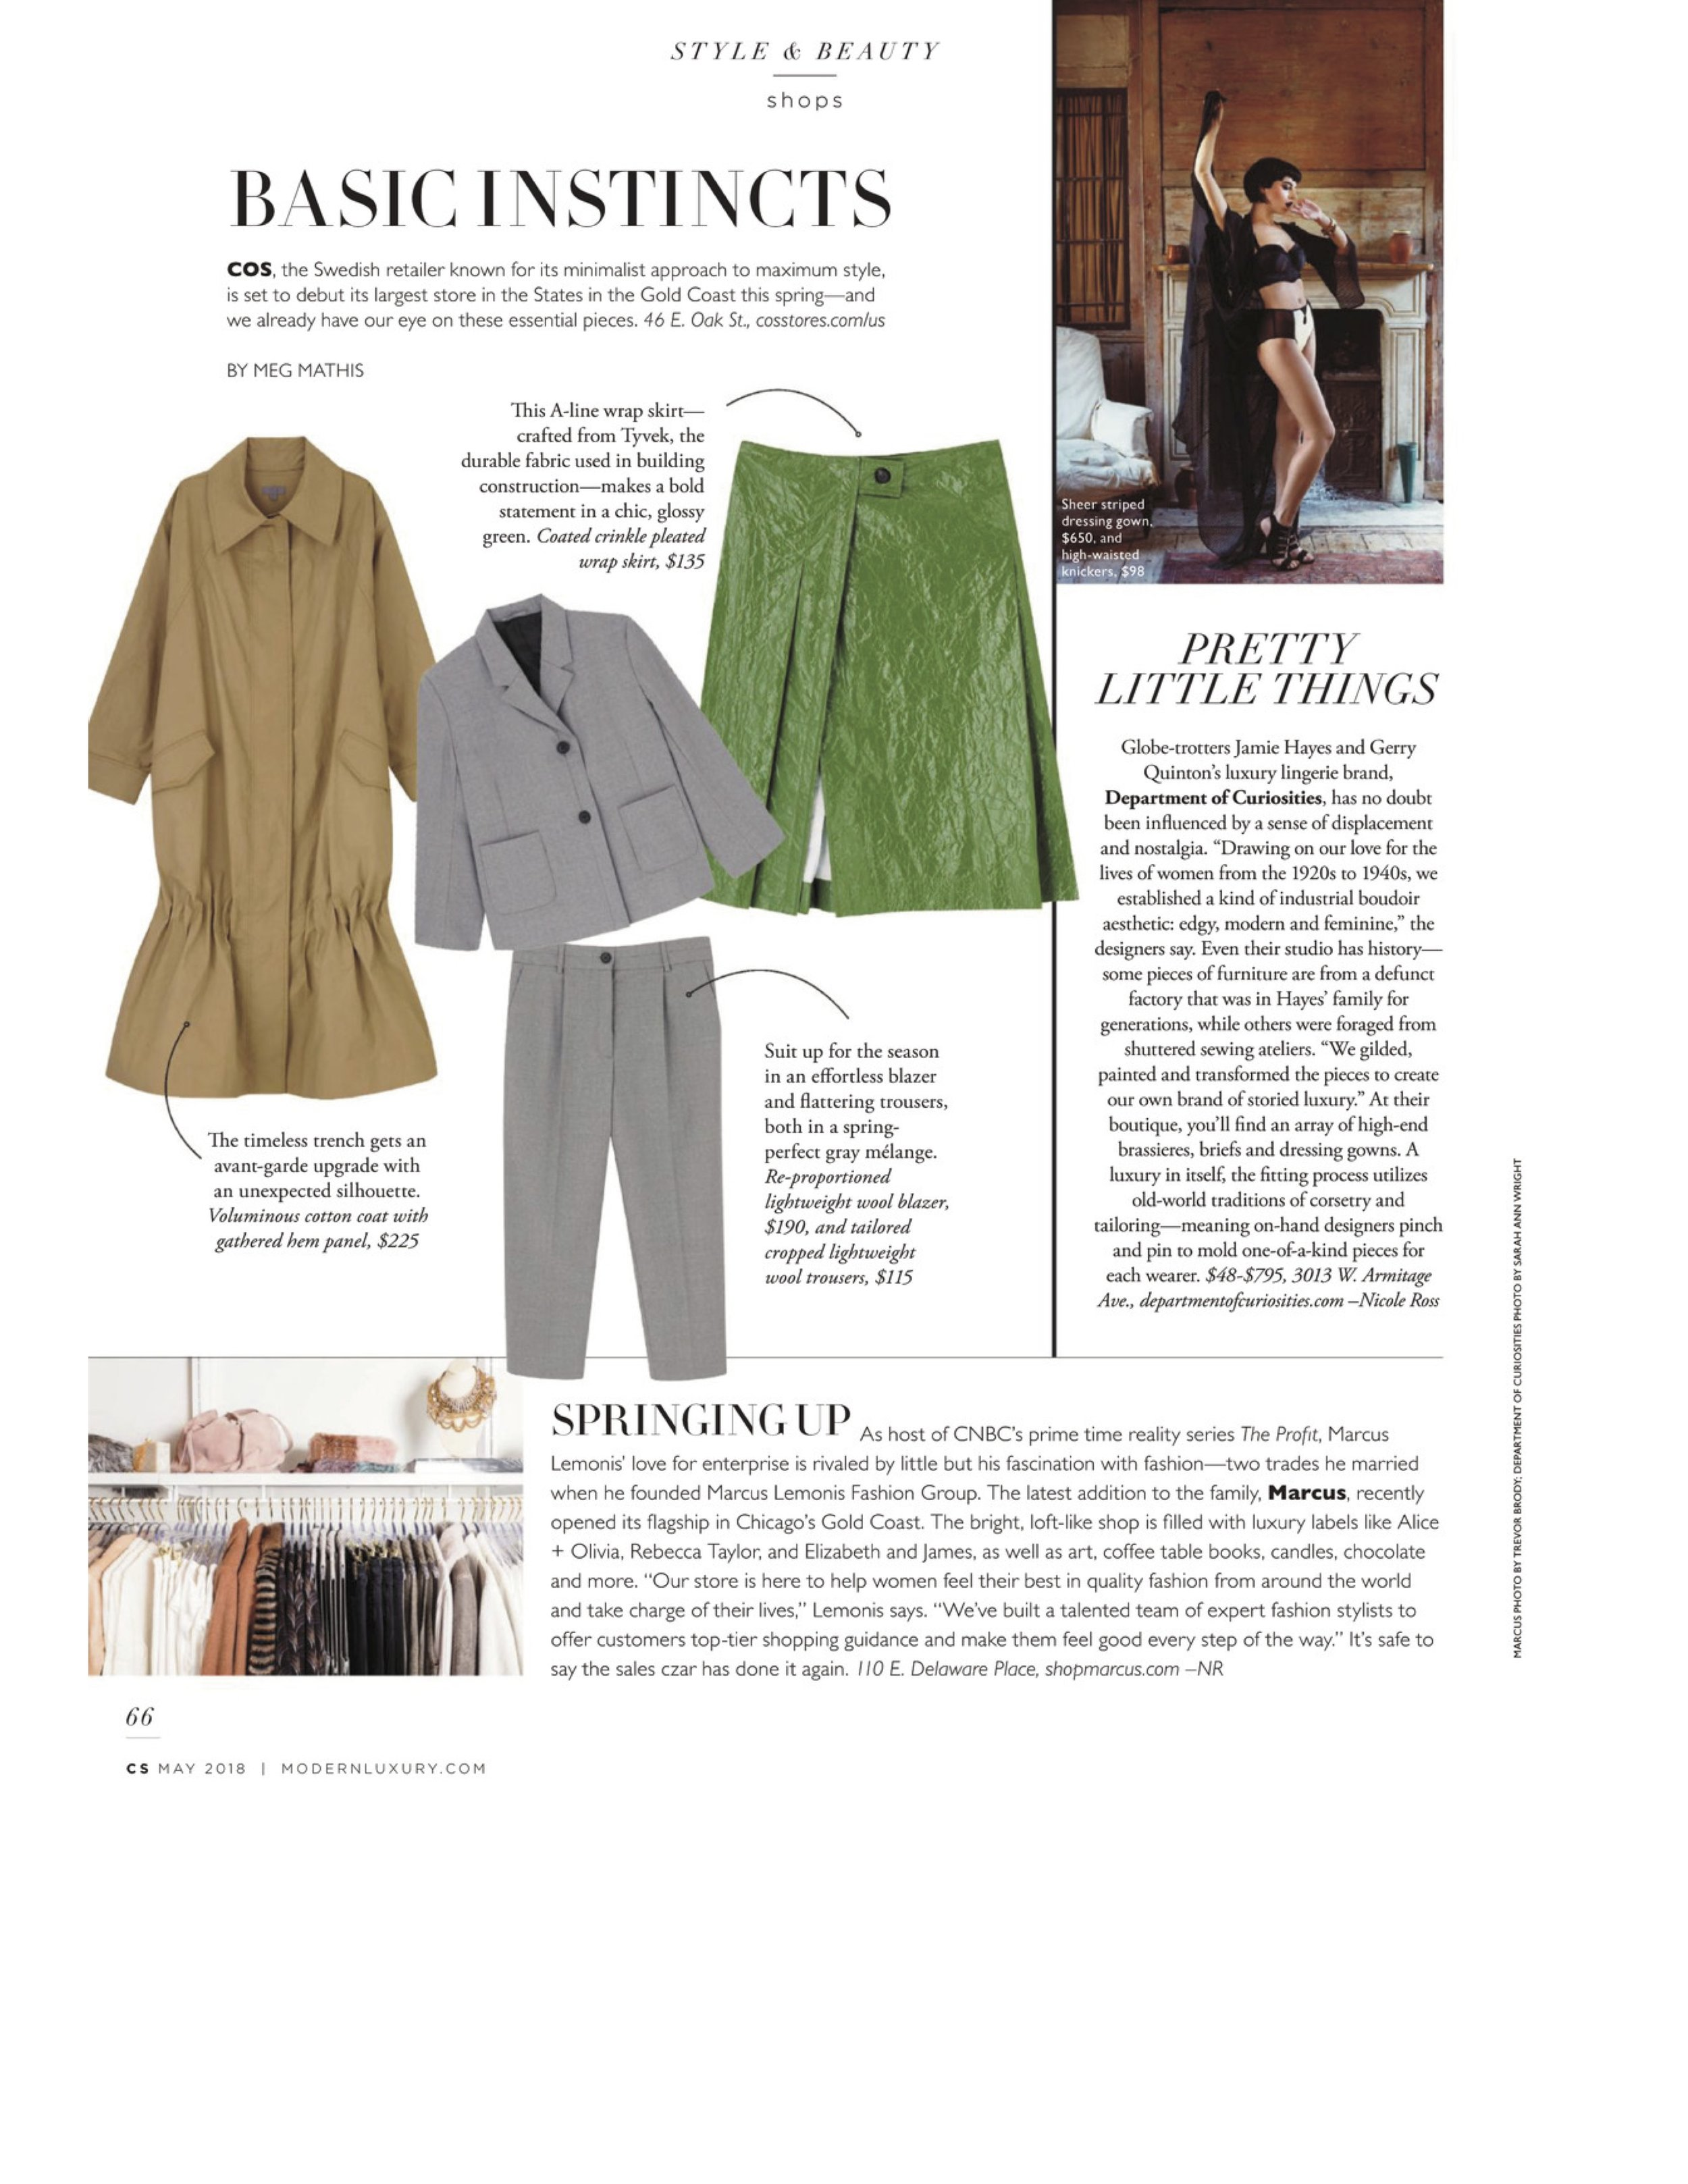 CS May Shops Digital Edition | Modern Luxury.jpg